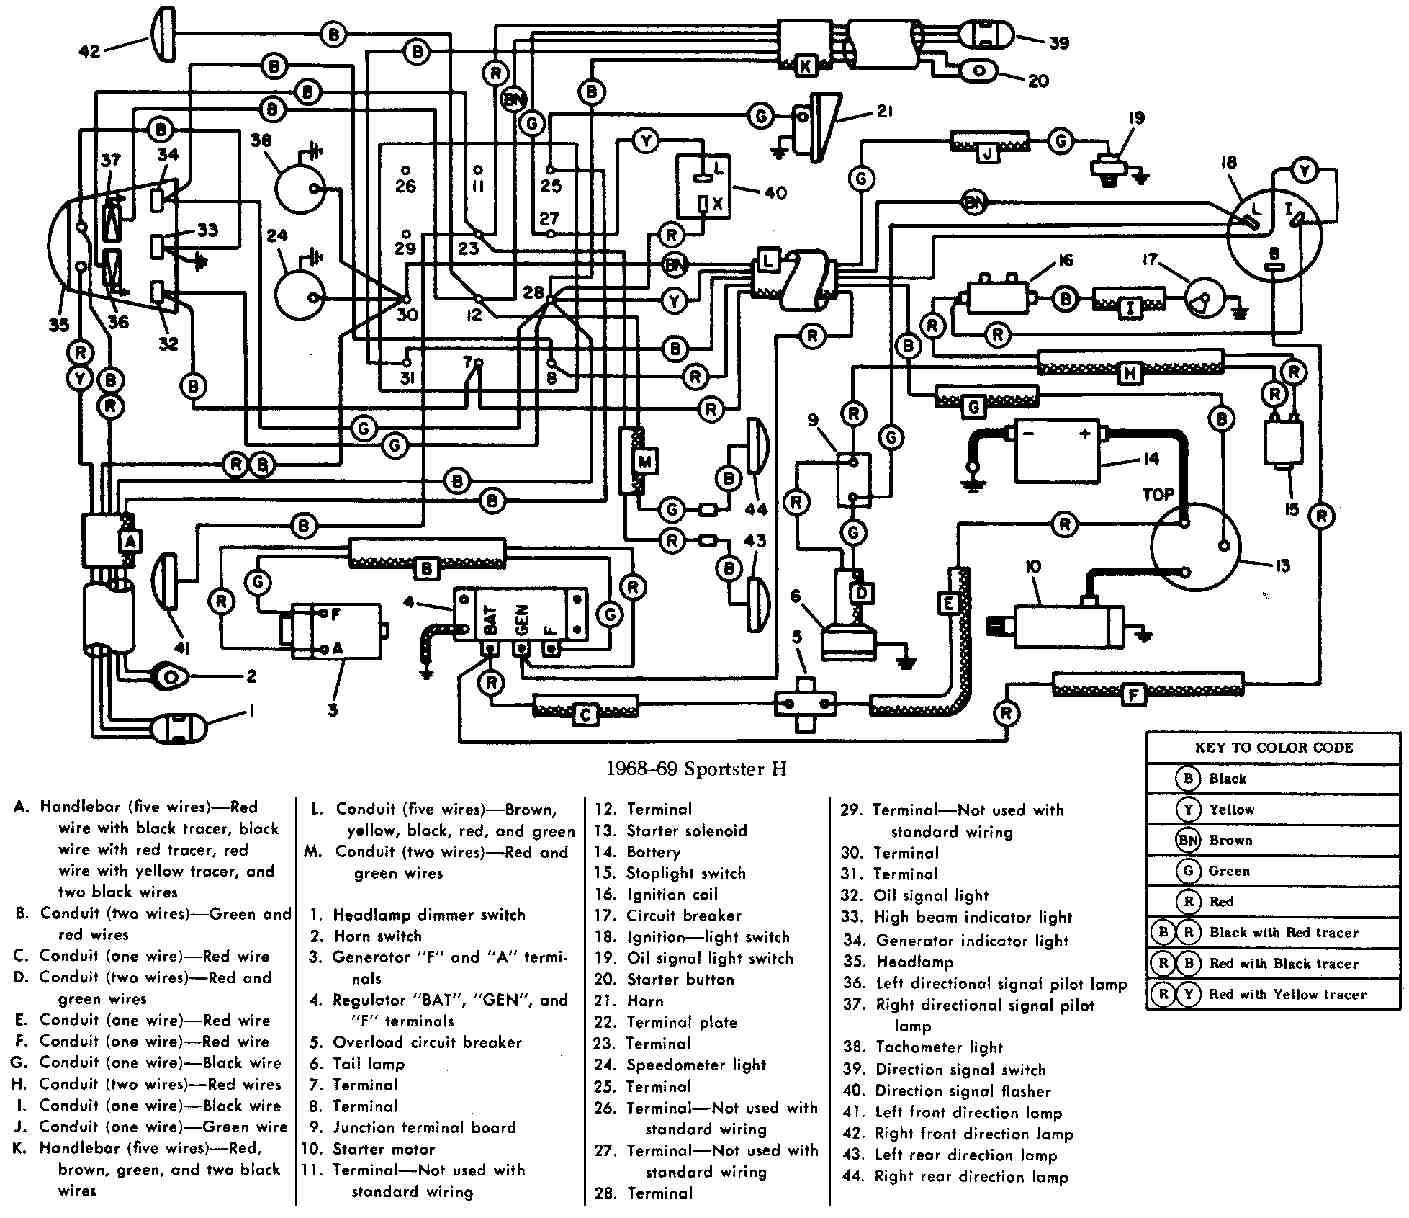 small resolution of 1973 flh wiring diagram dash wiring diagram autovehiclewiring diagrams online 6503 harley davidson forums wiring diagram